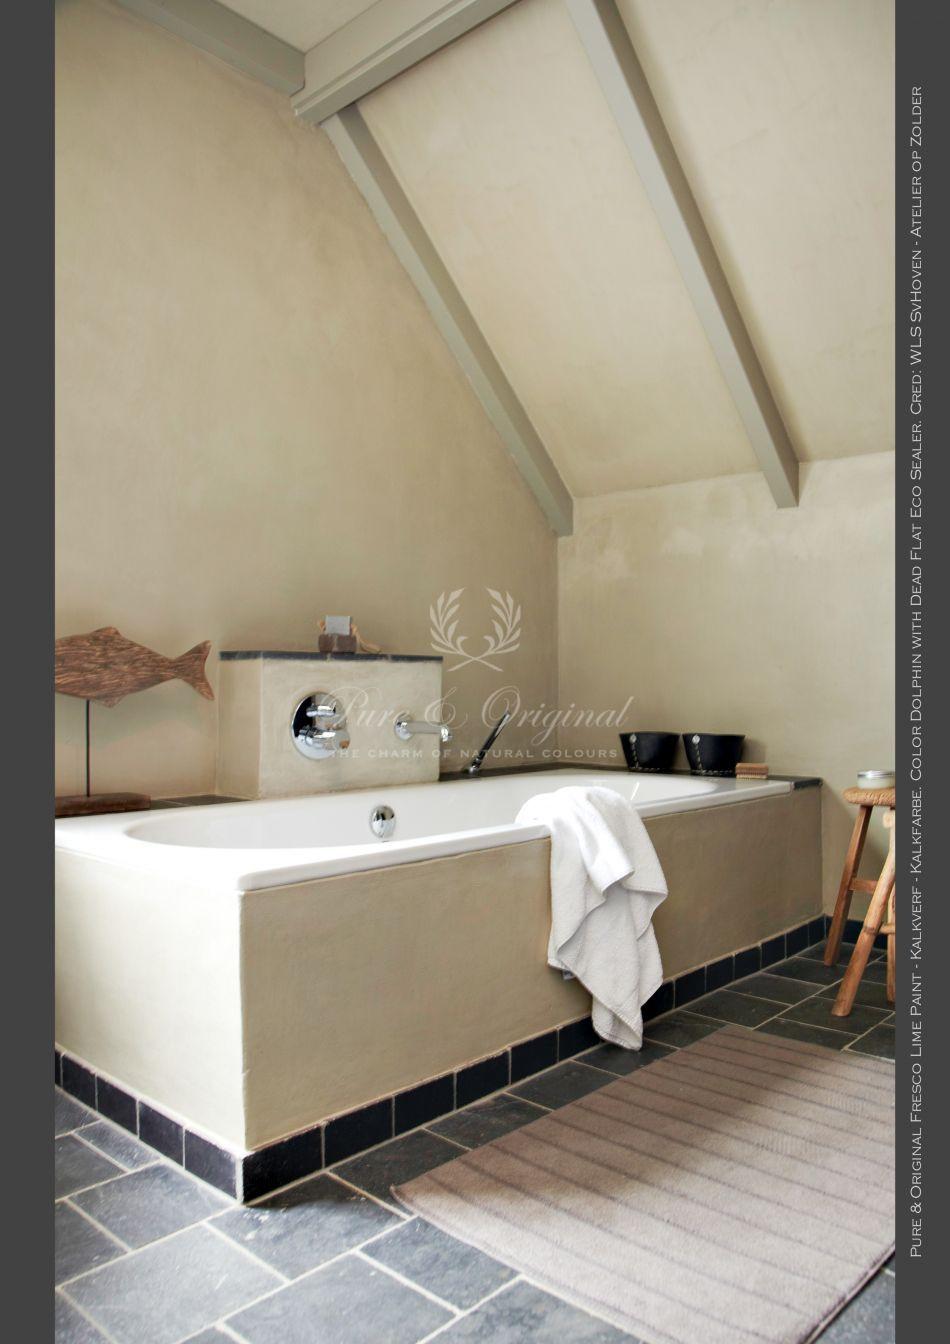 Pure Original Fresco Kalkverf in the bathroom - badkamer Color ...